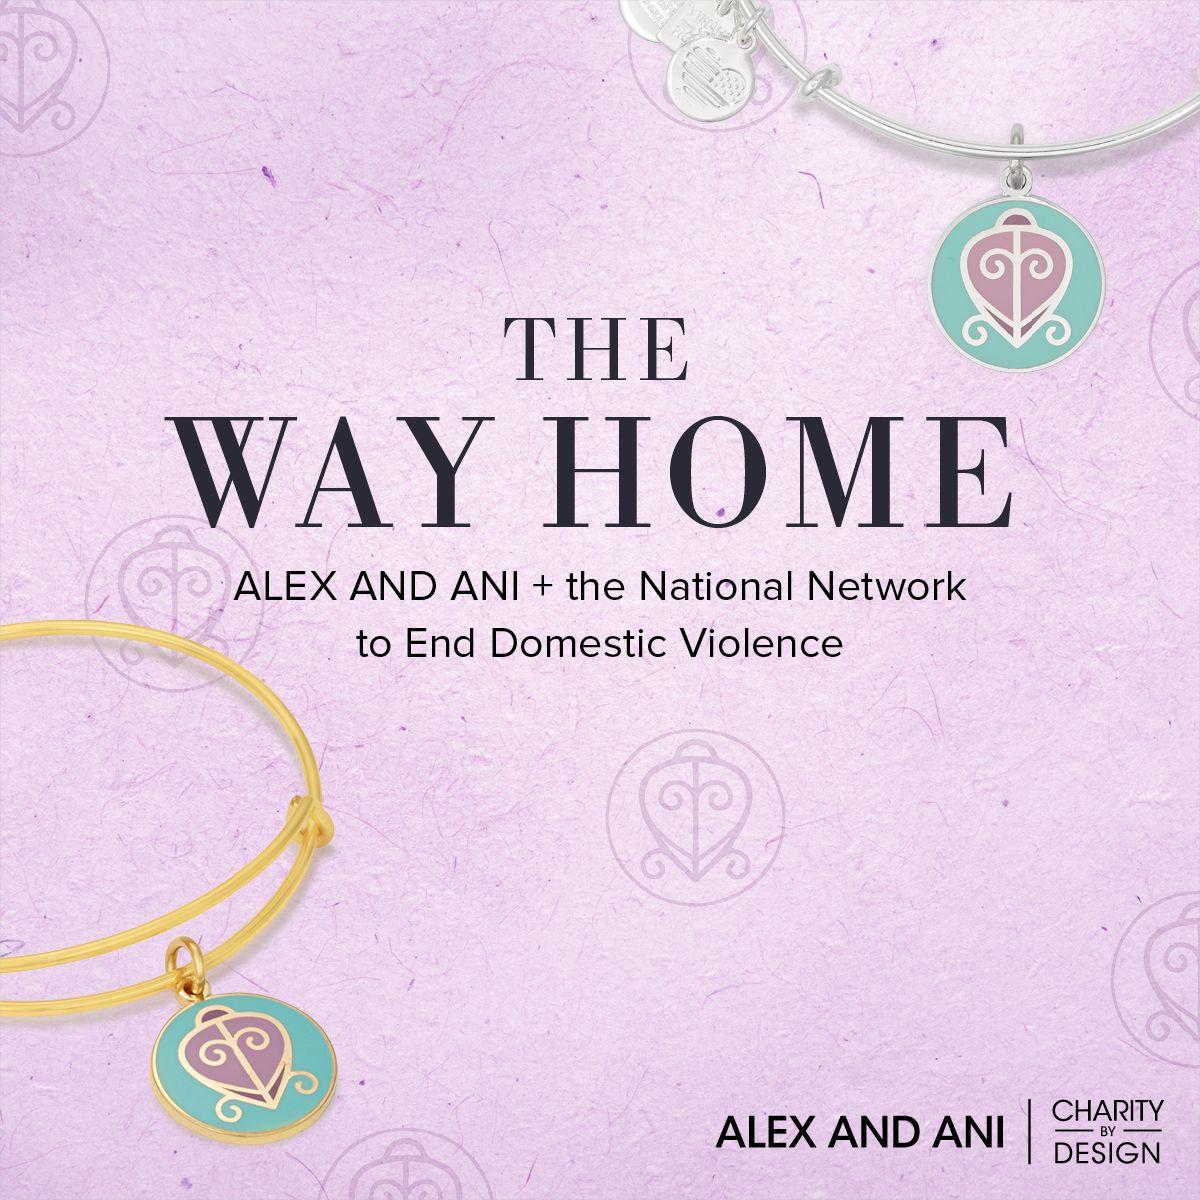 #CHARITYBYDESIGN: http://www.alexandani.com/the-way-home-charm-bangle.html